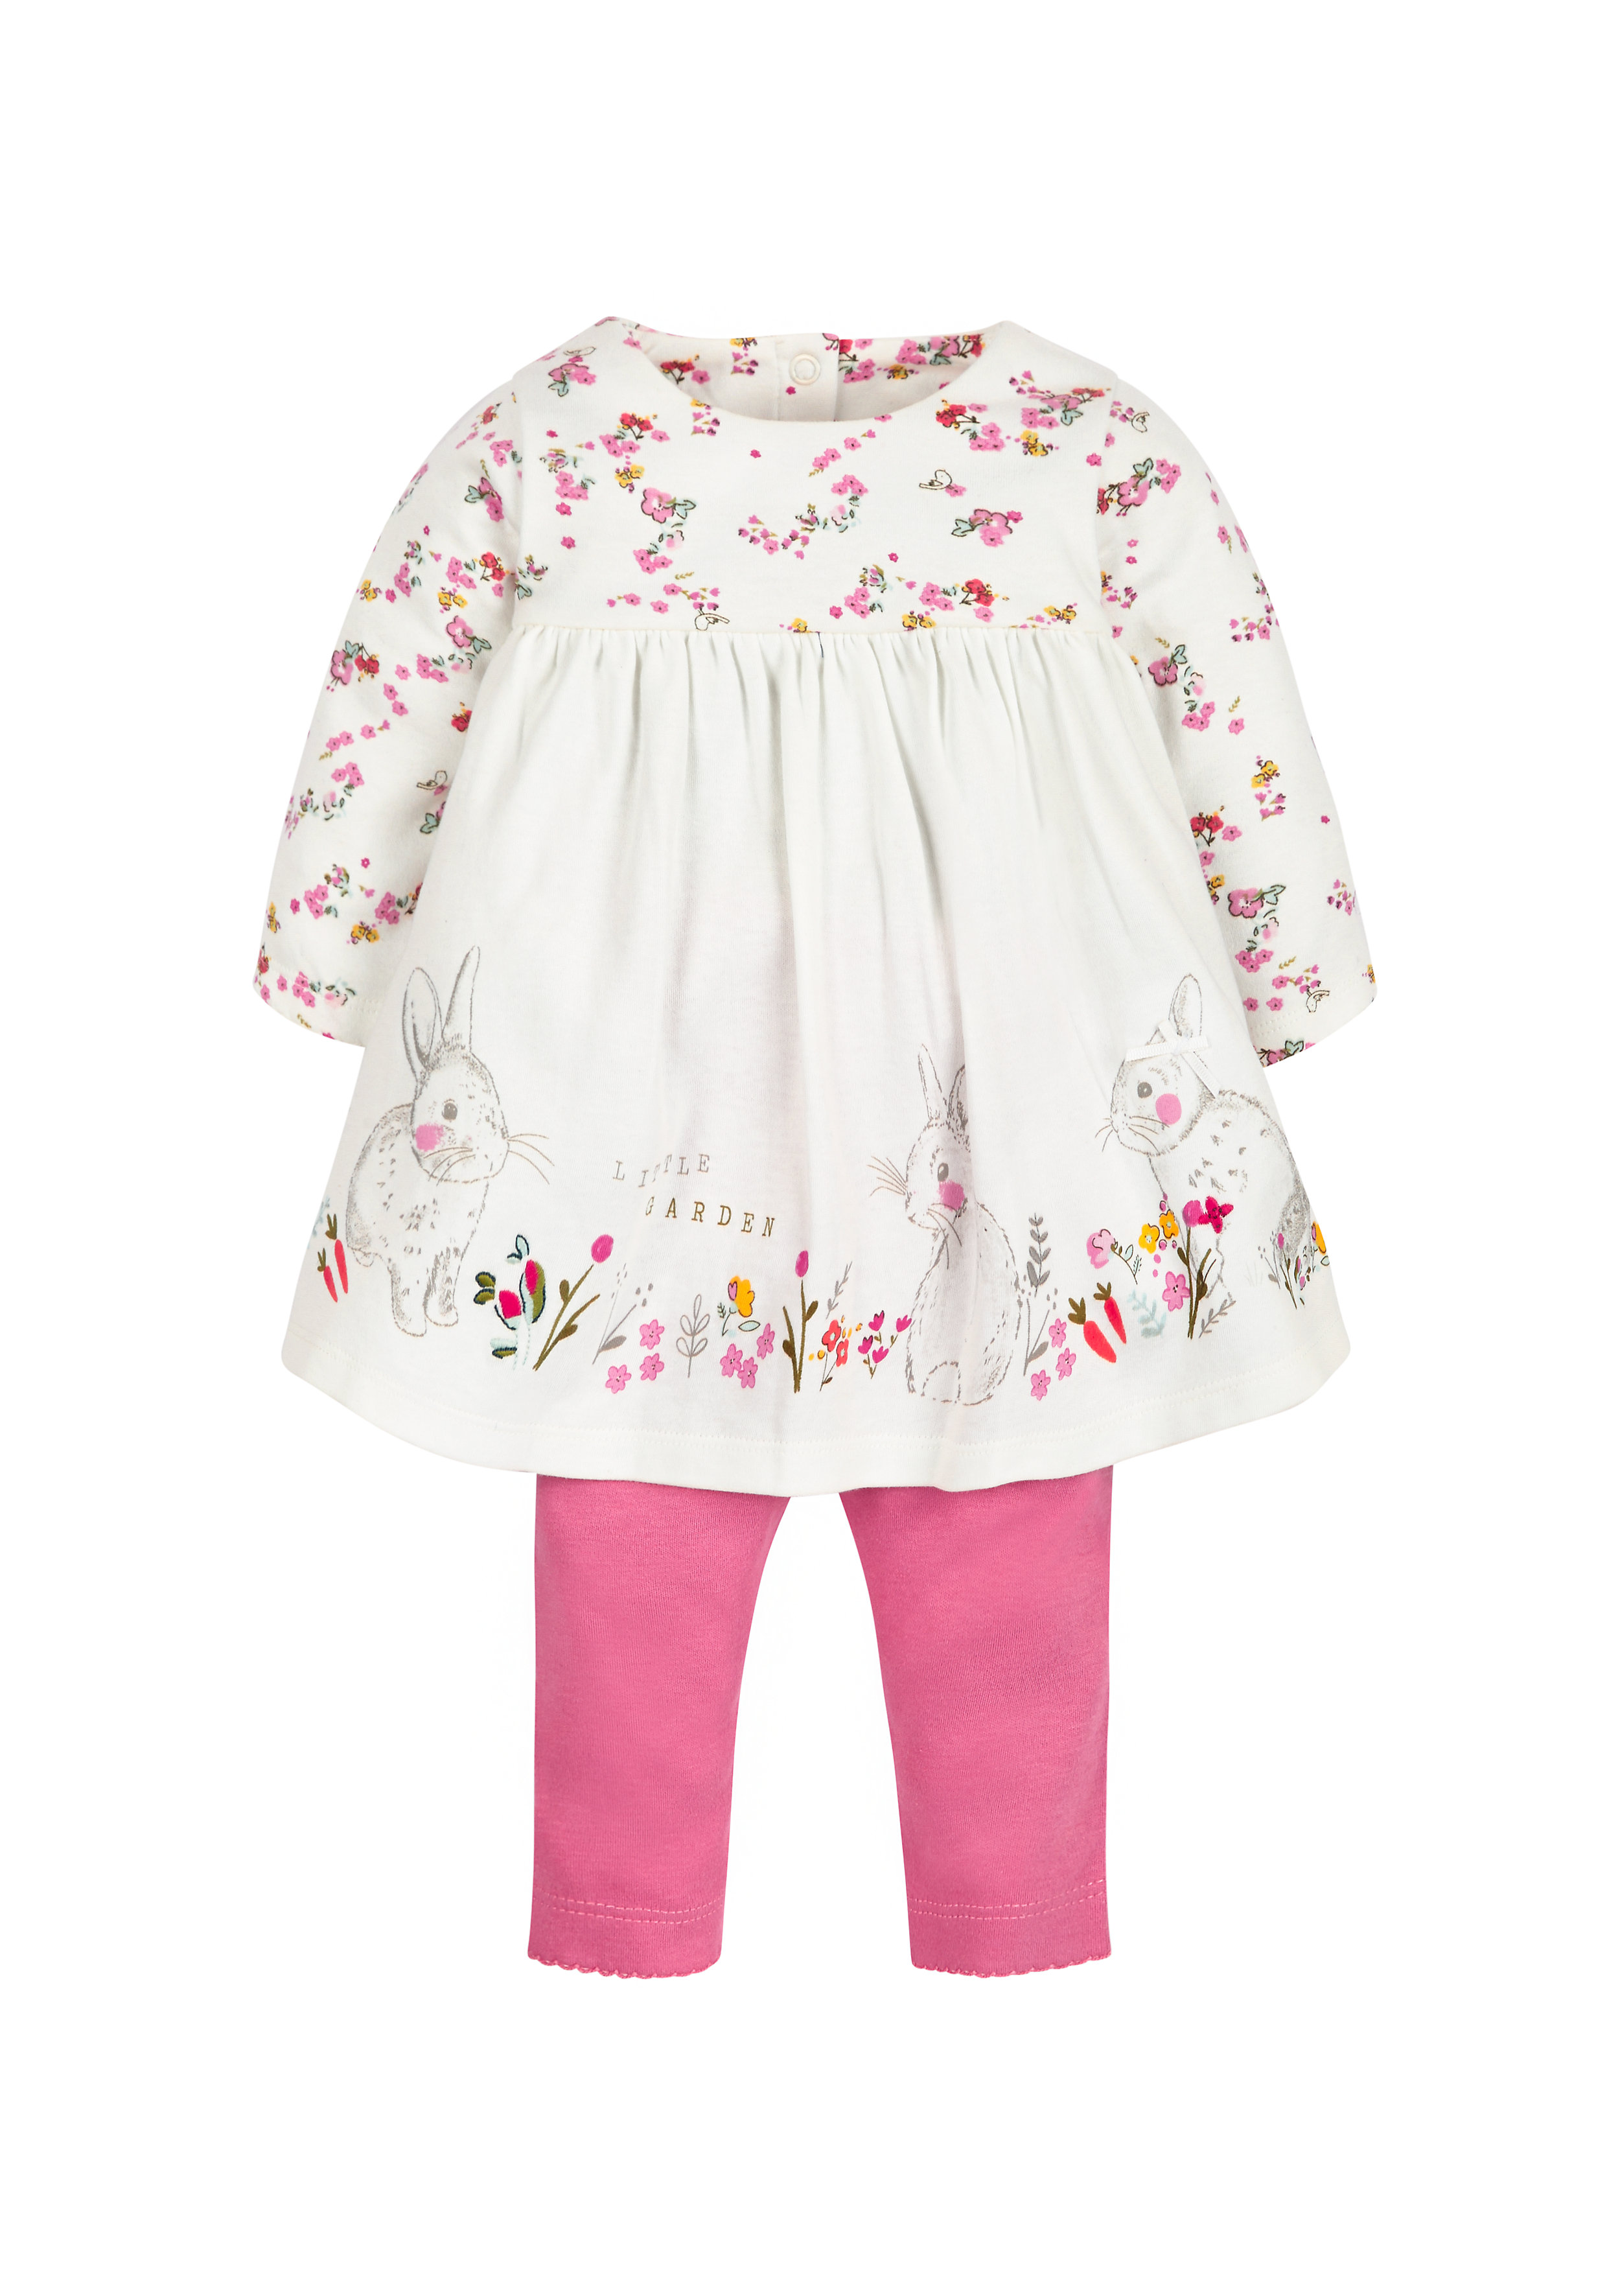 Mothercare | Girls Floral Border Dress And Leggings Set - White